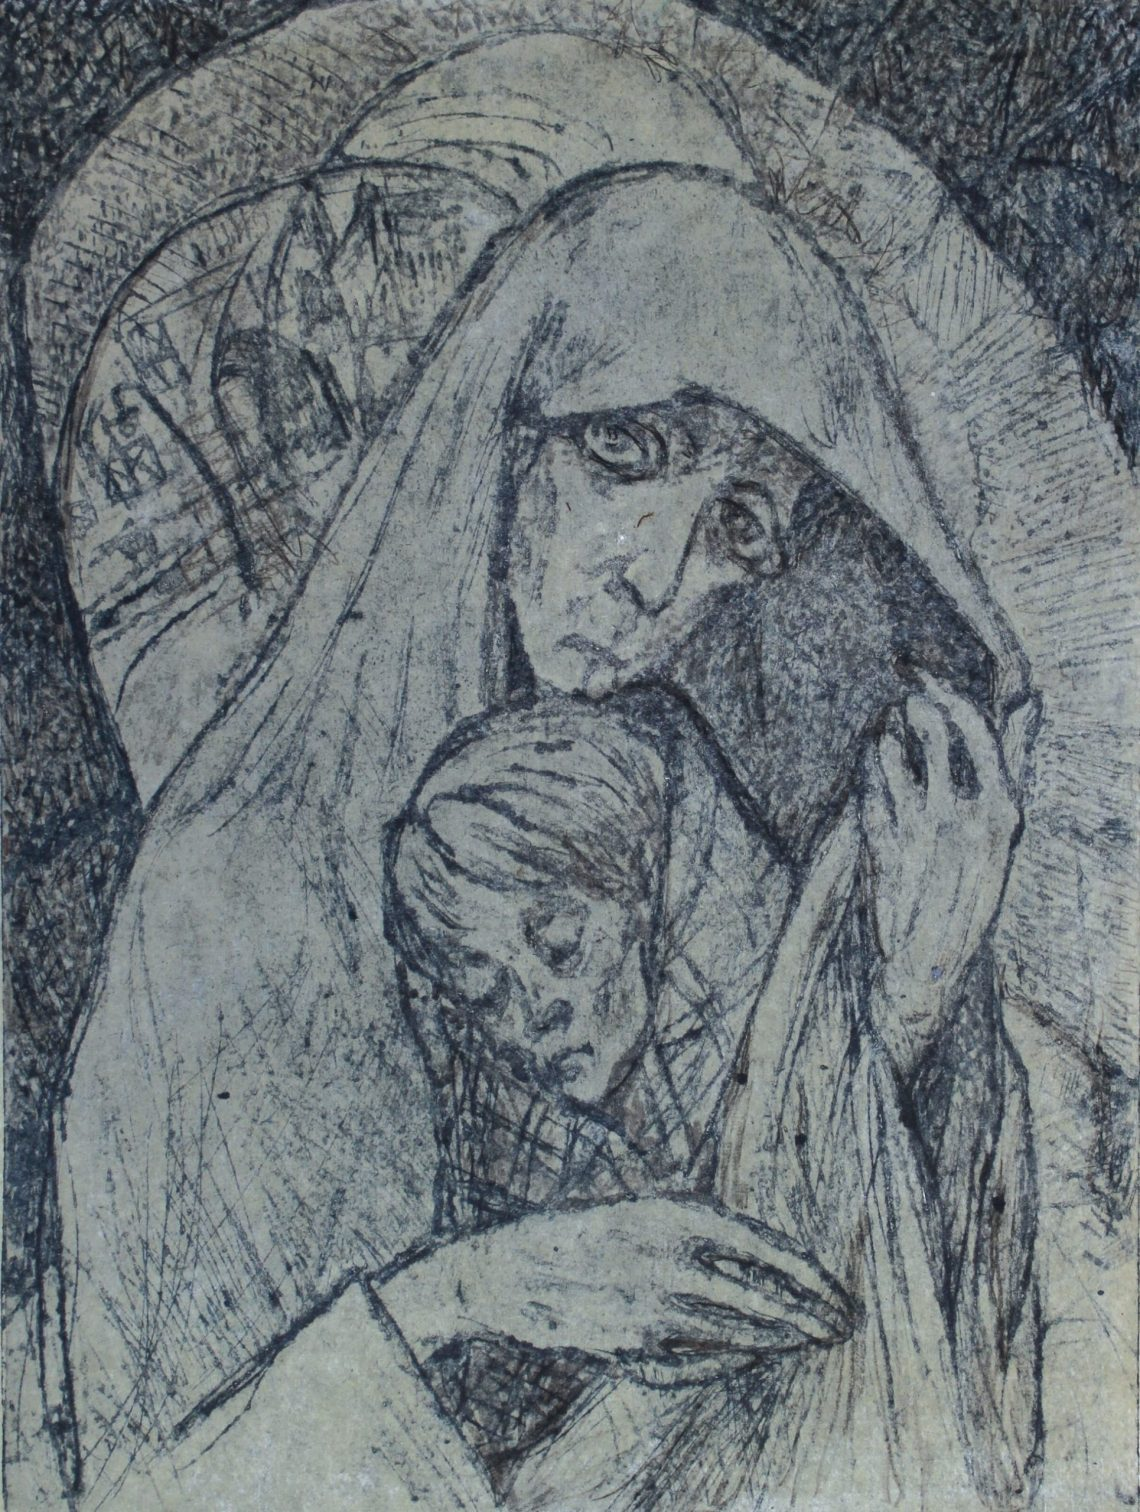 leningrad-madonna-194290 elena martilla